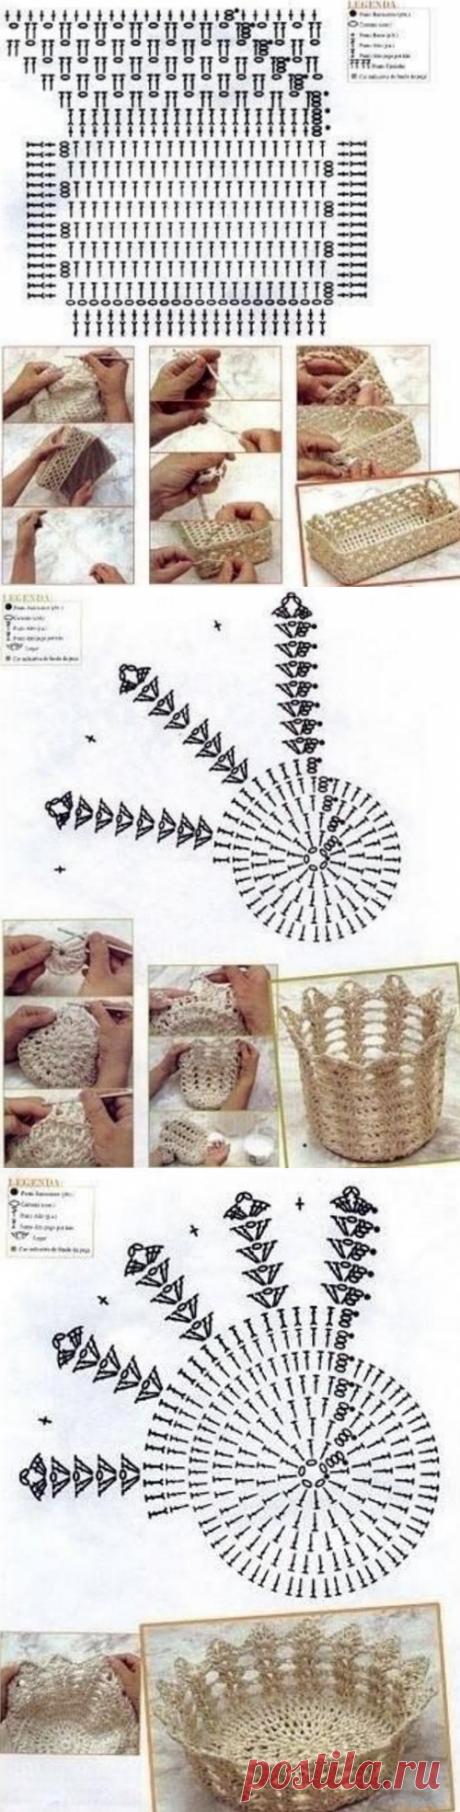 Схемы корзинок крючком